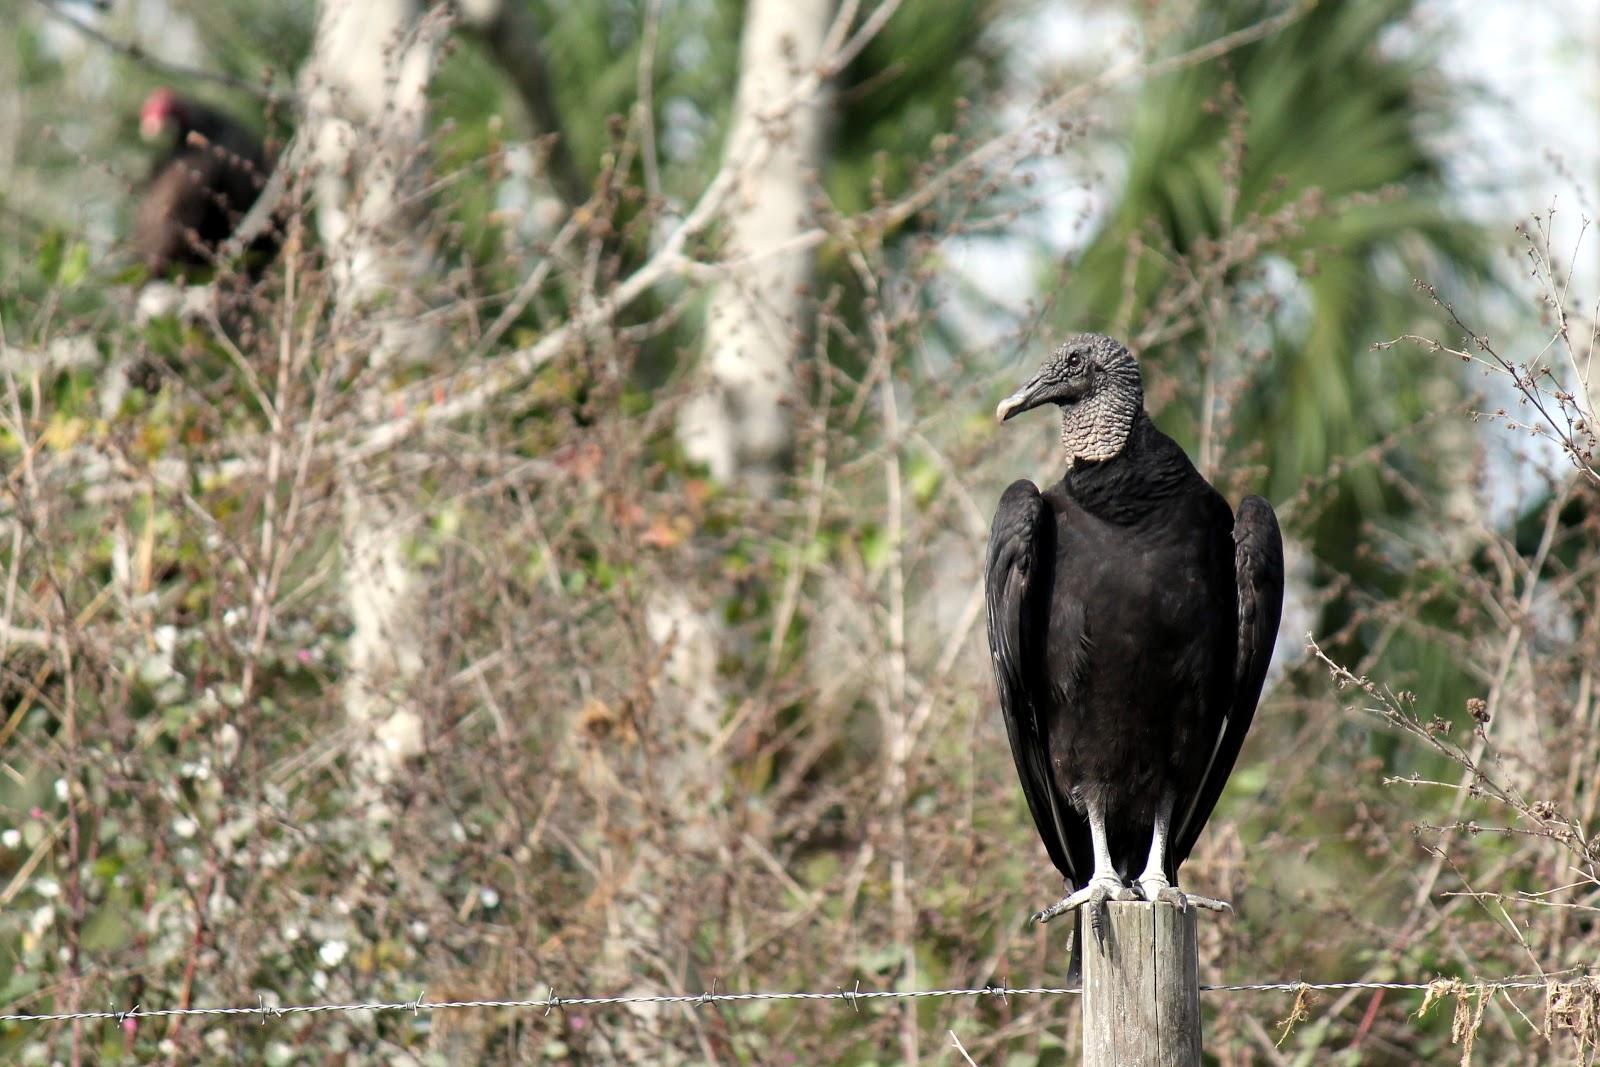 birds of prey in their natural habitat